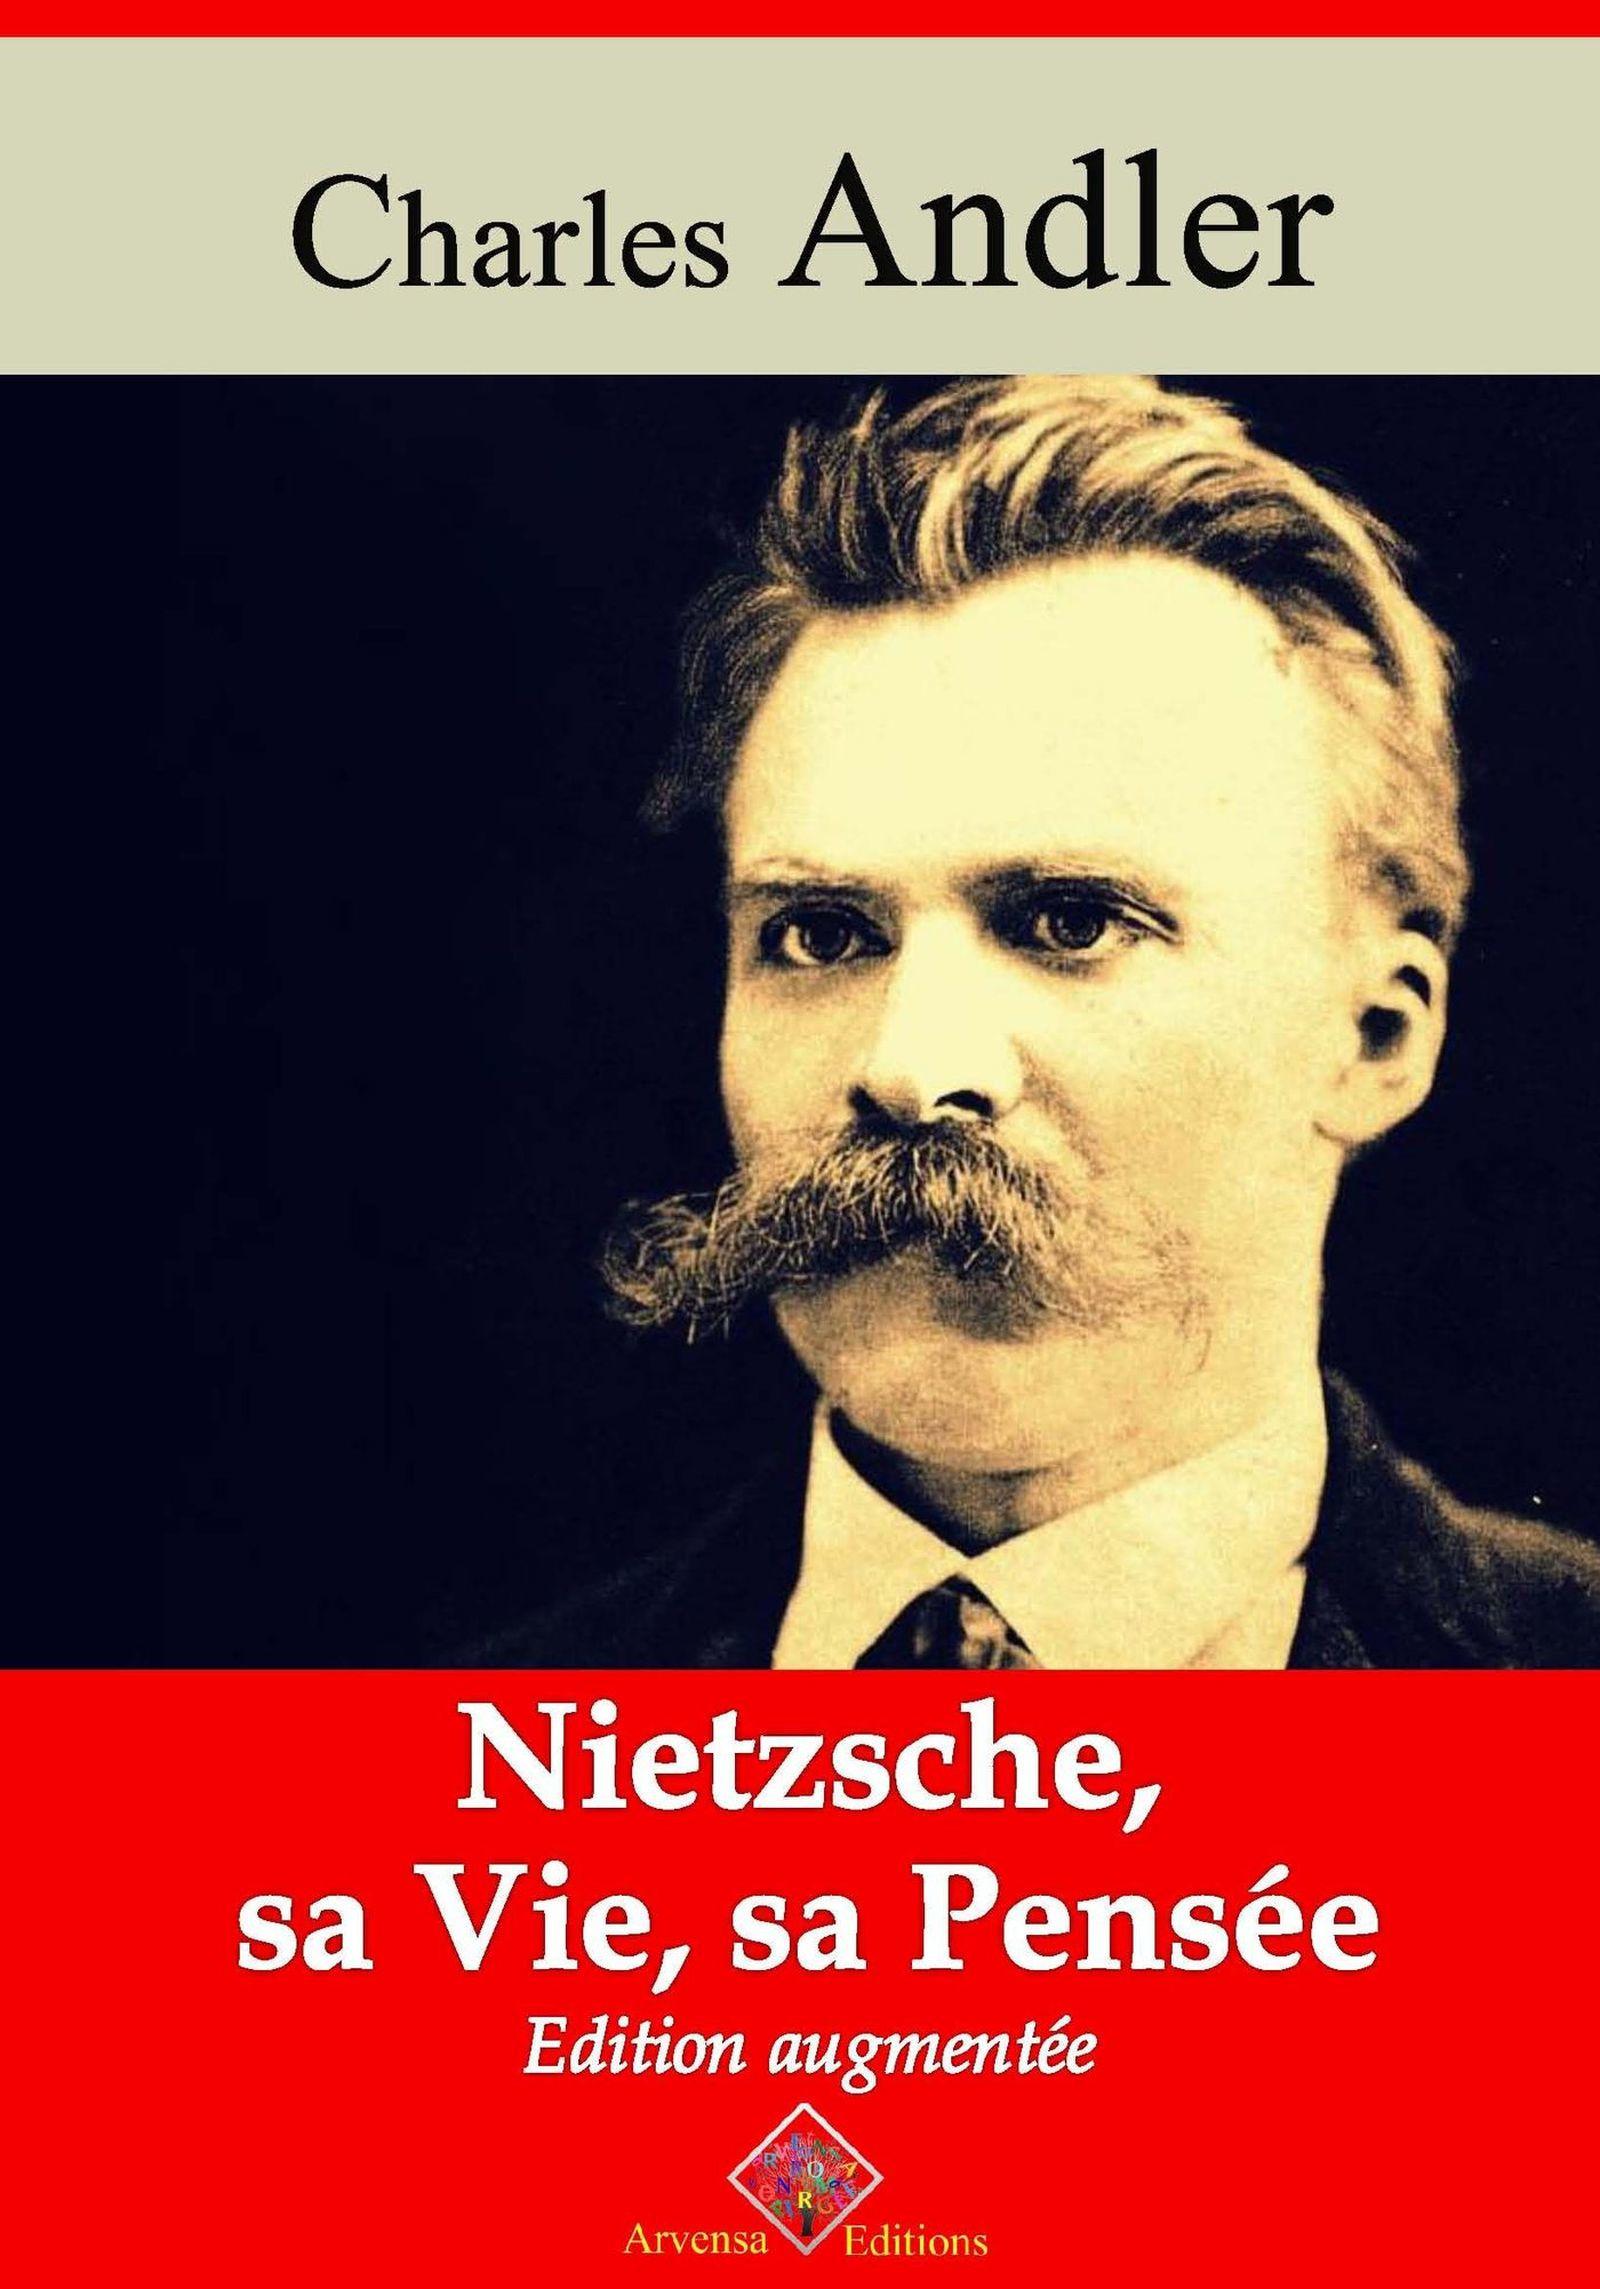 Nietzsche, sa vie et sa pensée - suivi d'annexes